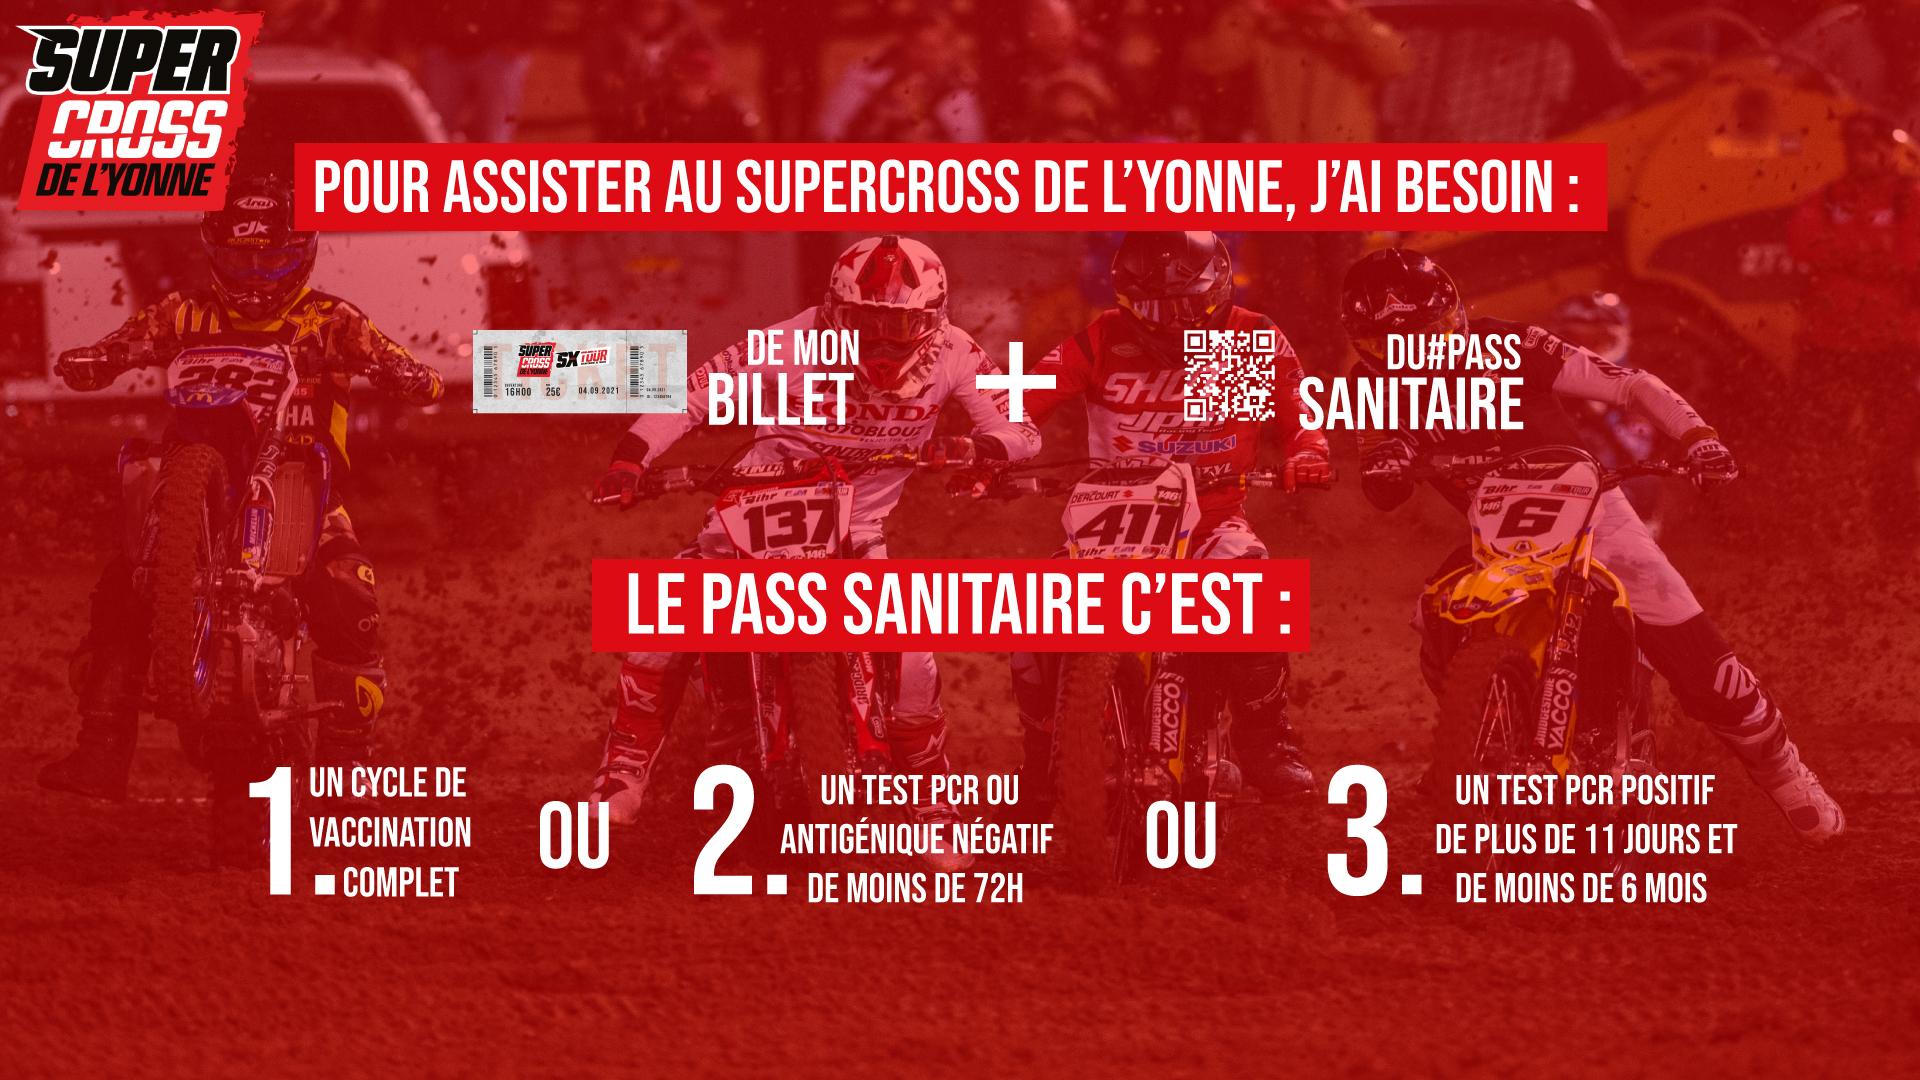 Supercross de l'Yonne 2021 - Pass Sanitaire